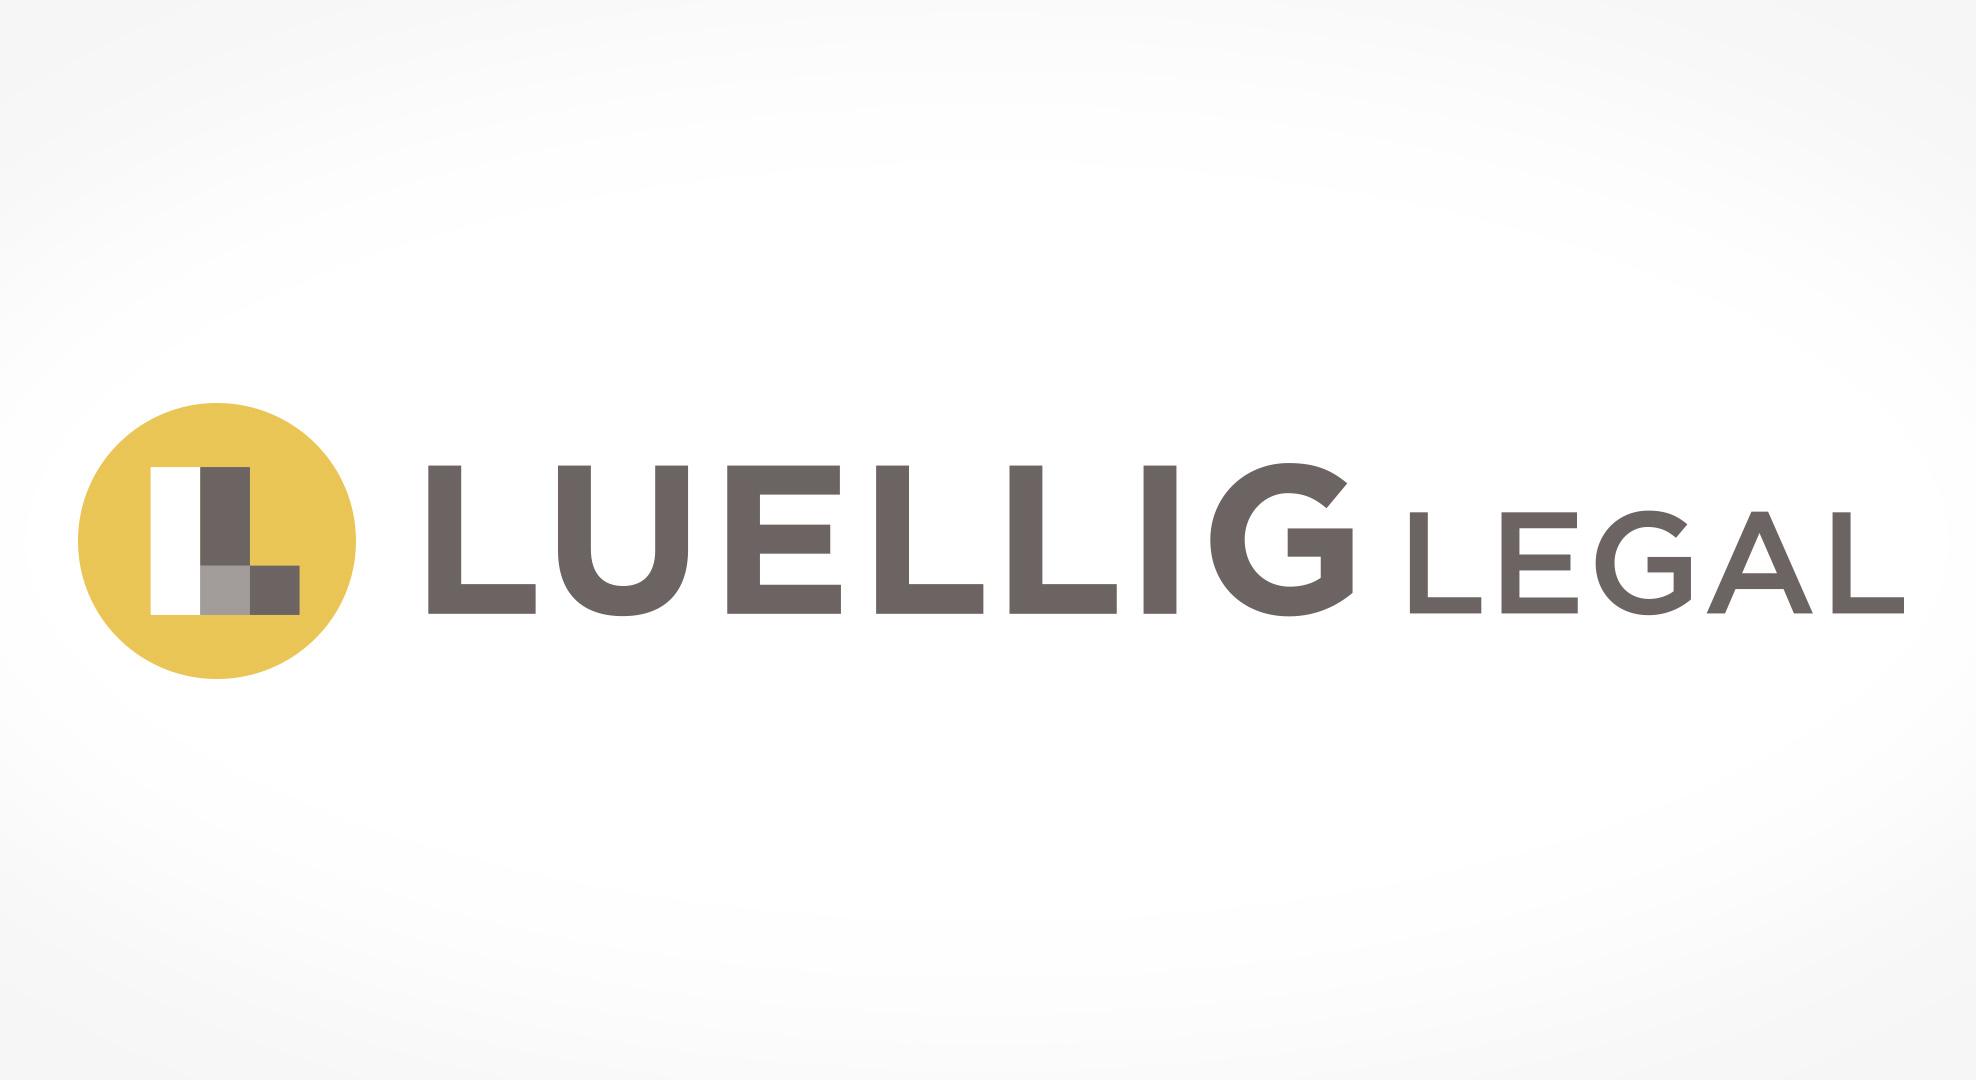 Luellig Legal